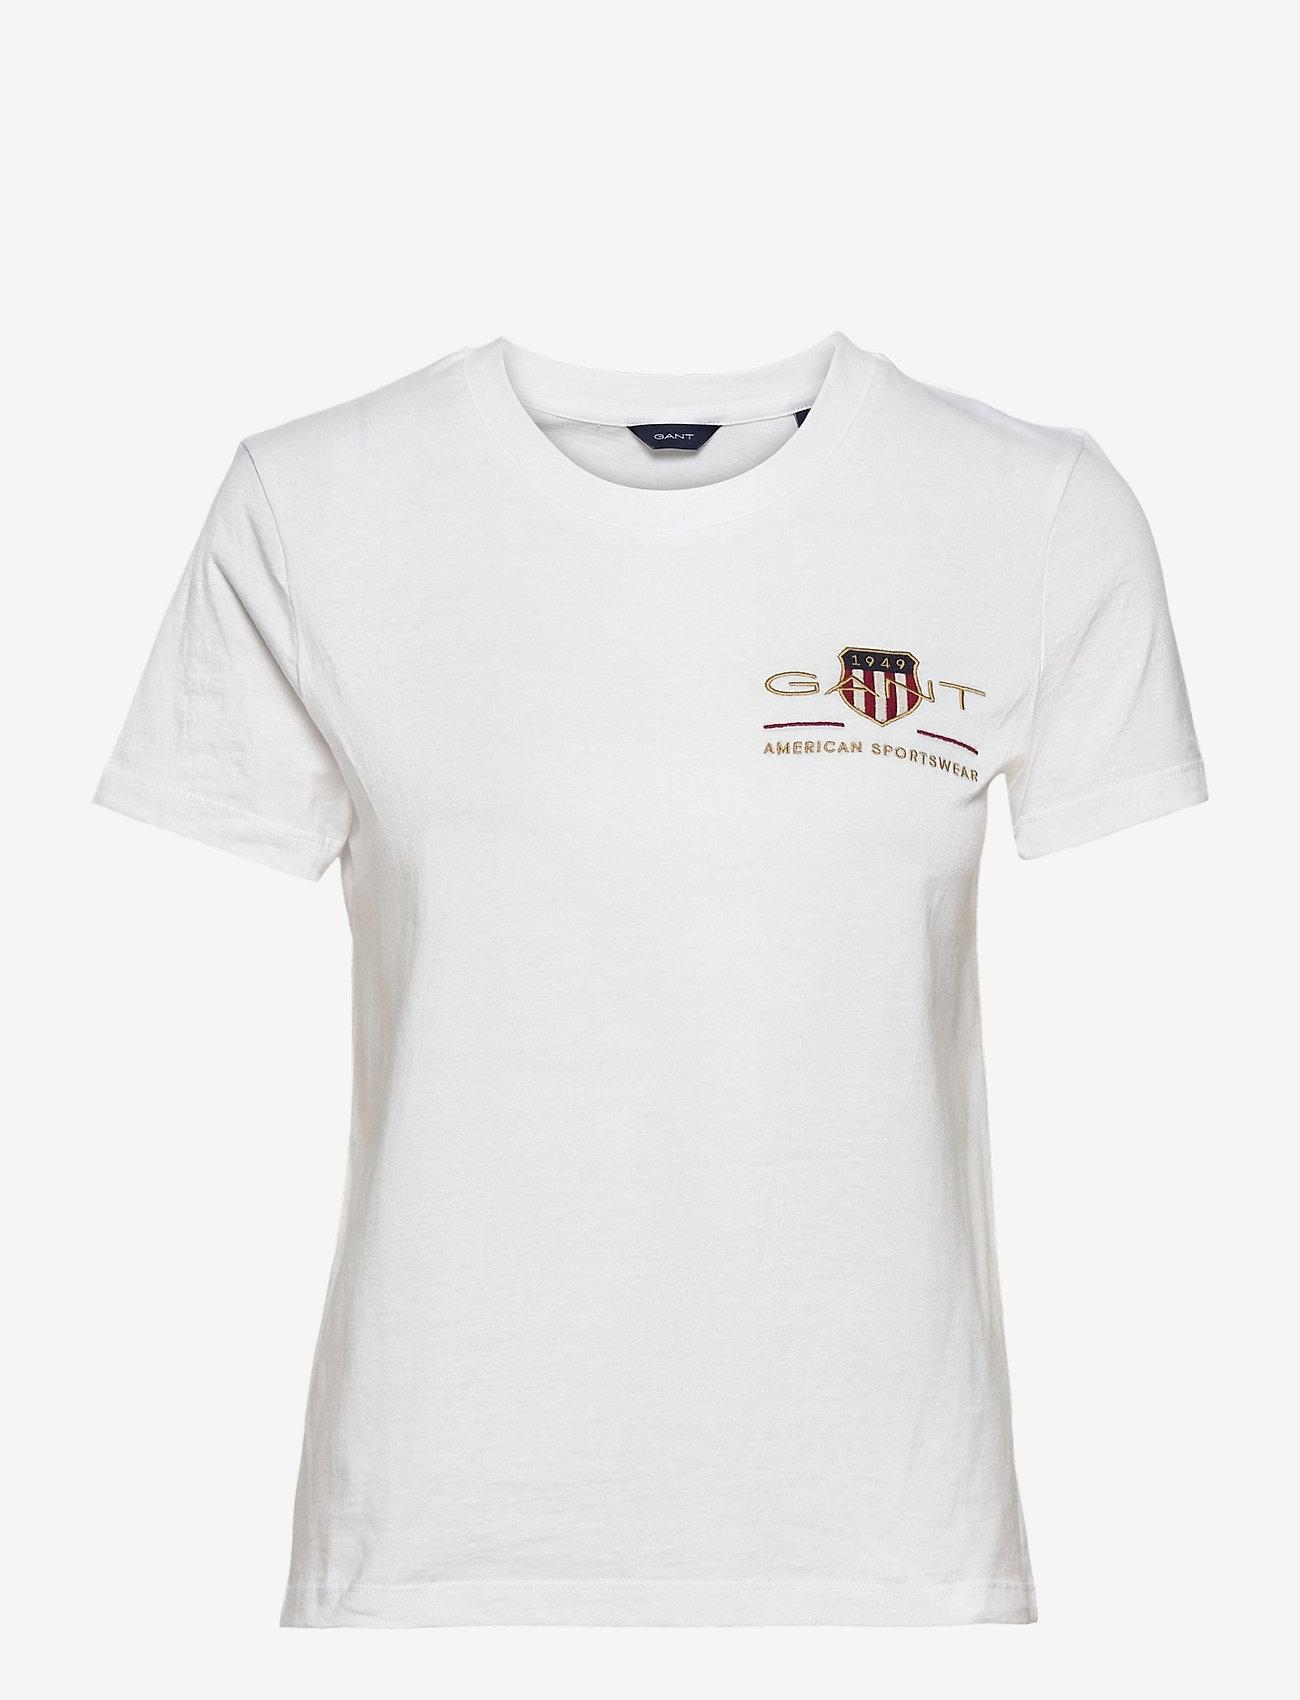 GANT - ARCHIVE SHIELD SS T-SHIRT - t-shirts - white - 0